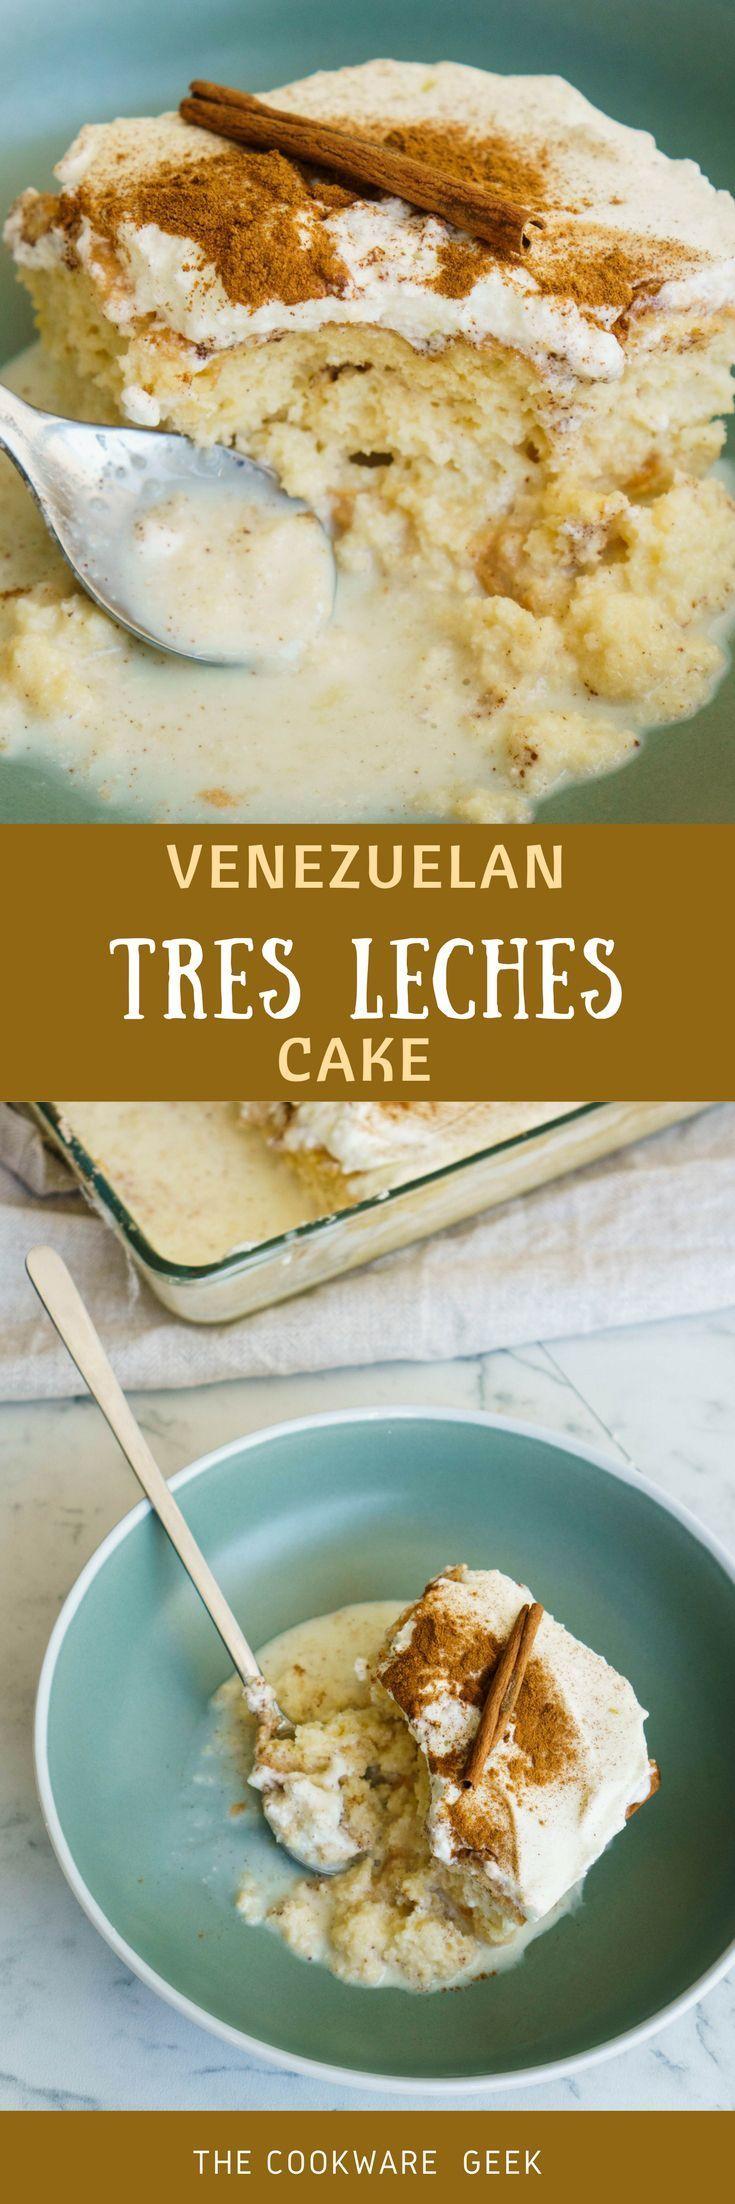 Venezuelan Tres Leches Cake - The Cookware Geek